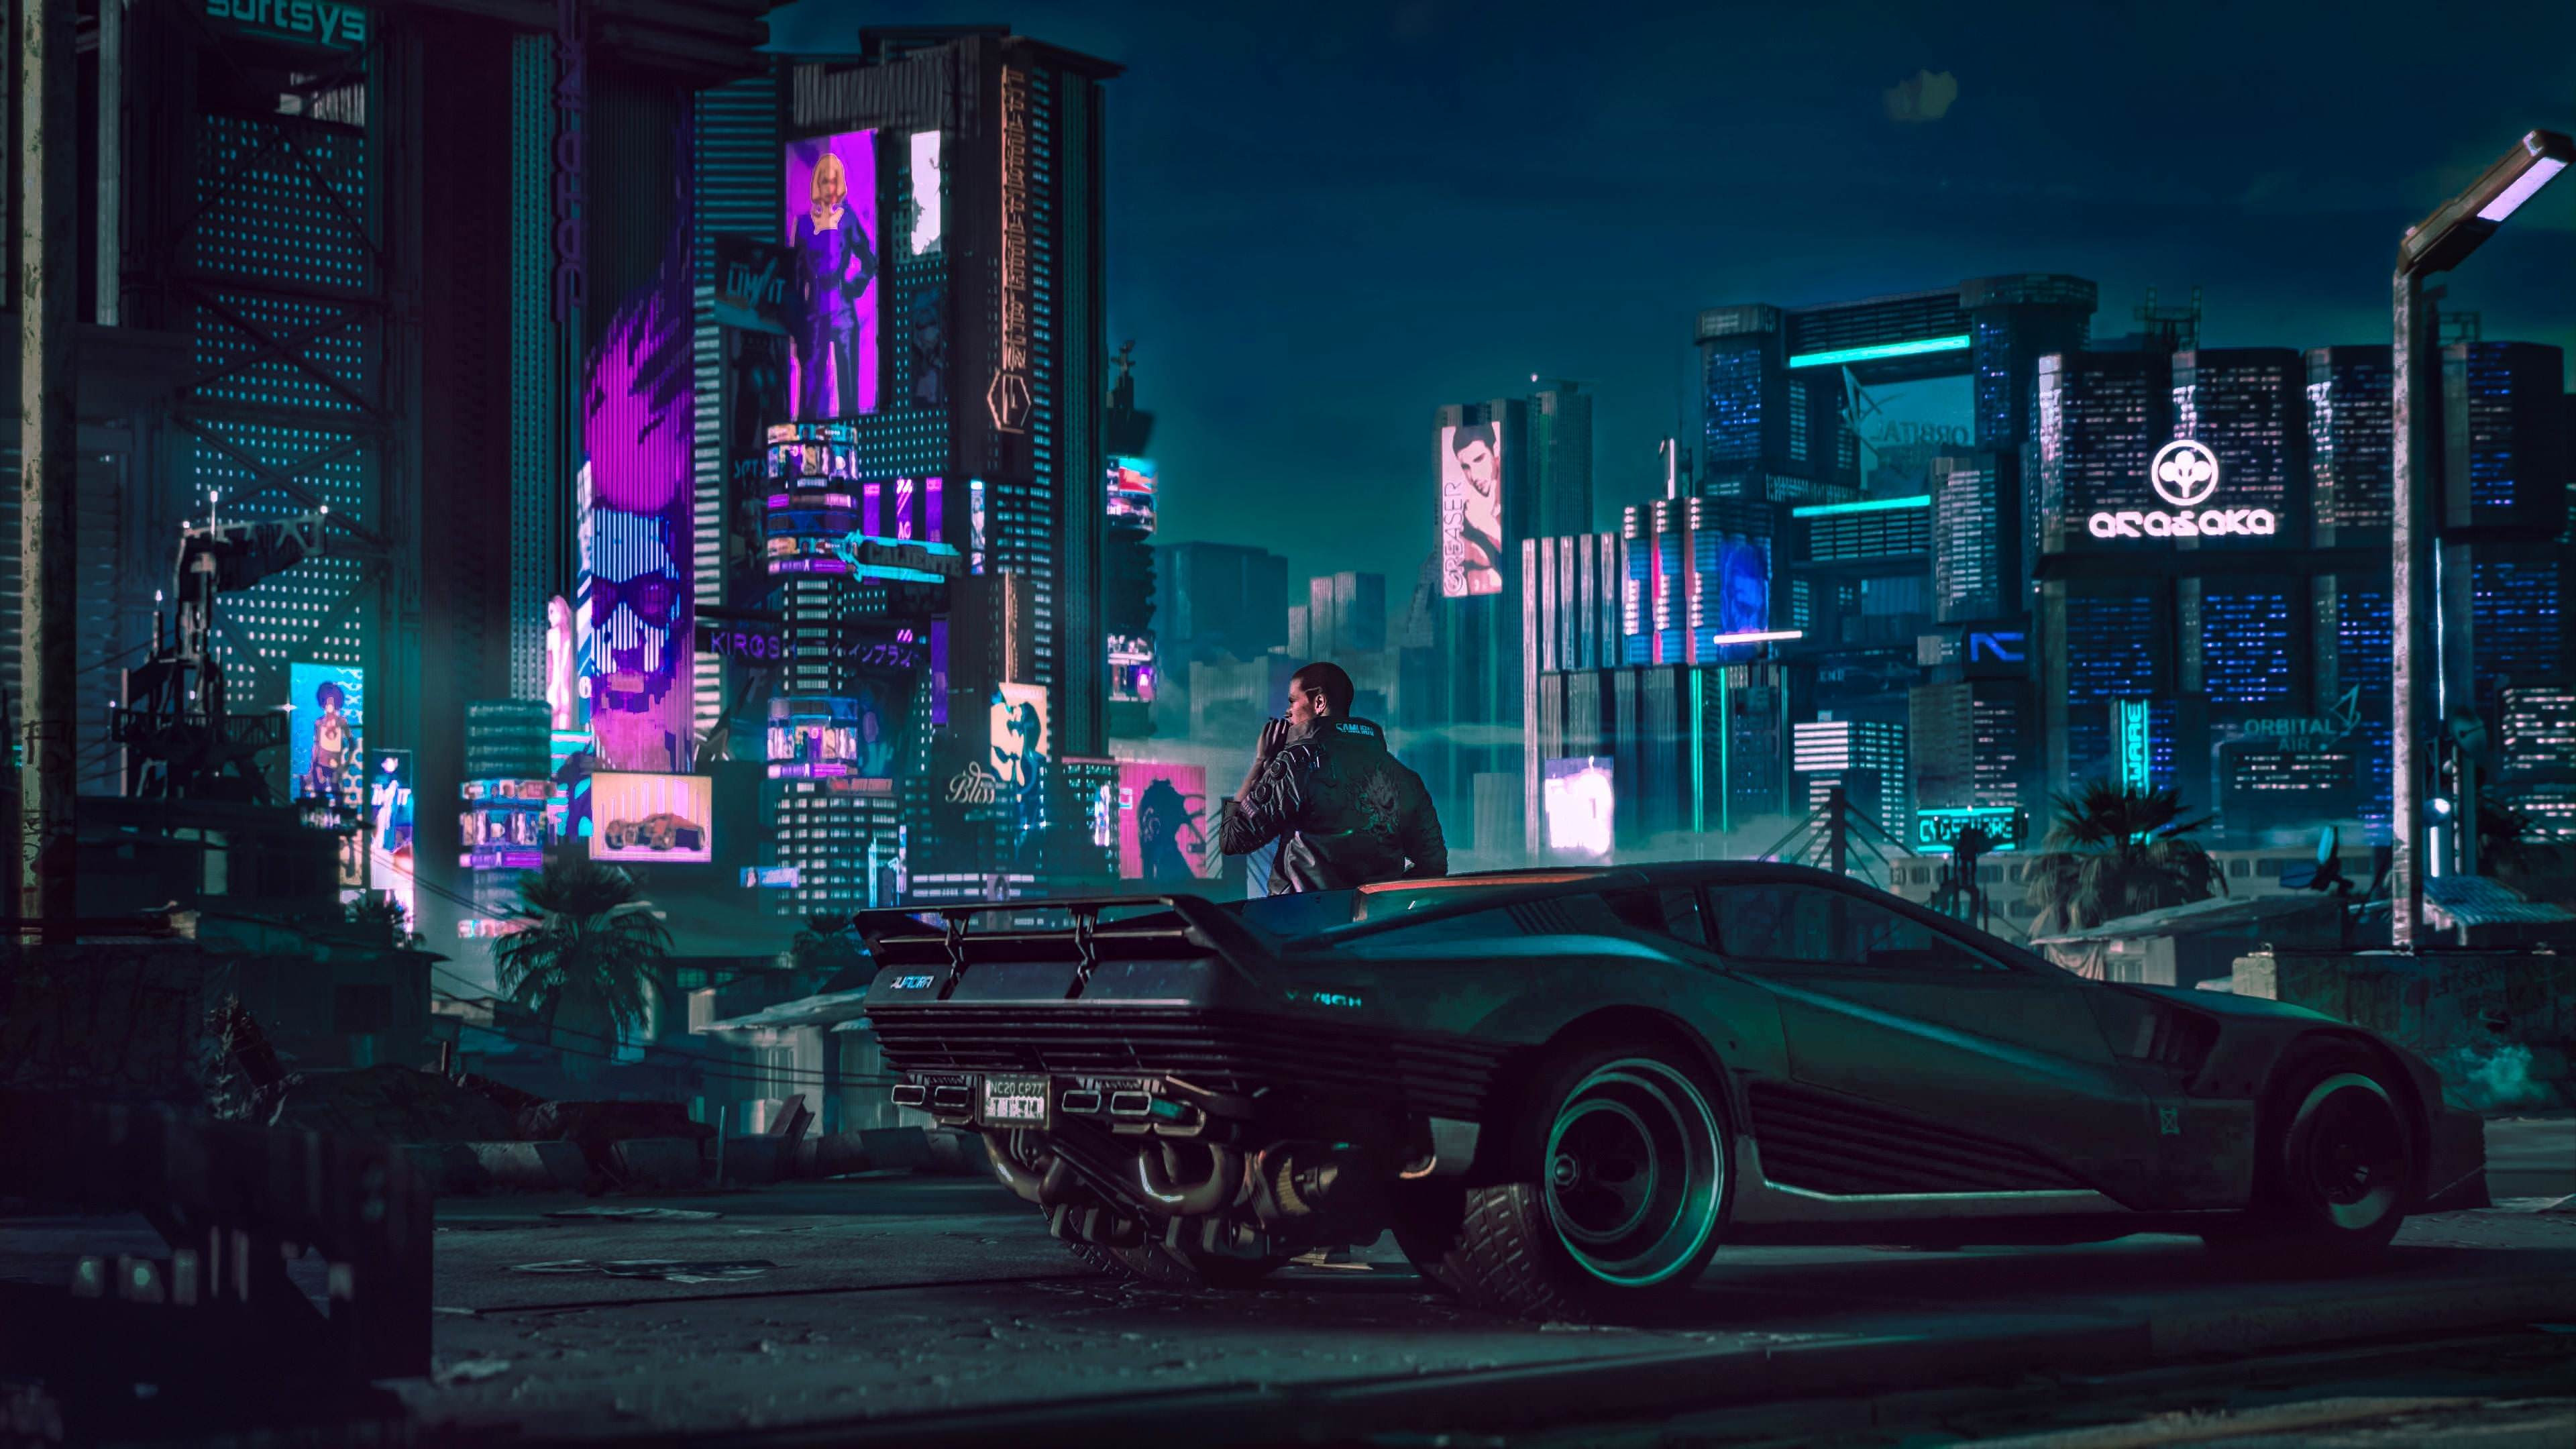 2018 Cyberpunk 2077 4k, HD Games, 4k Wallpapers, Images ...